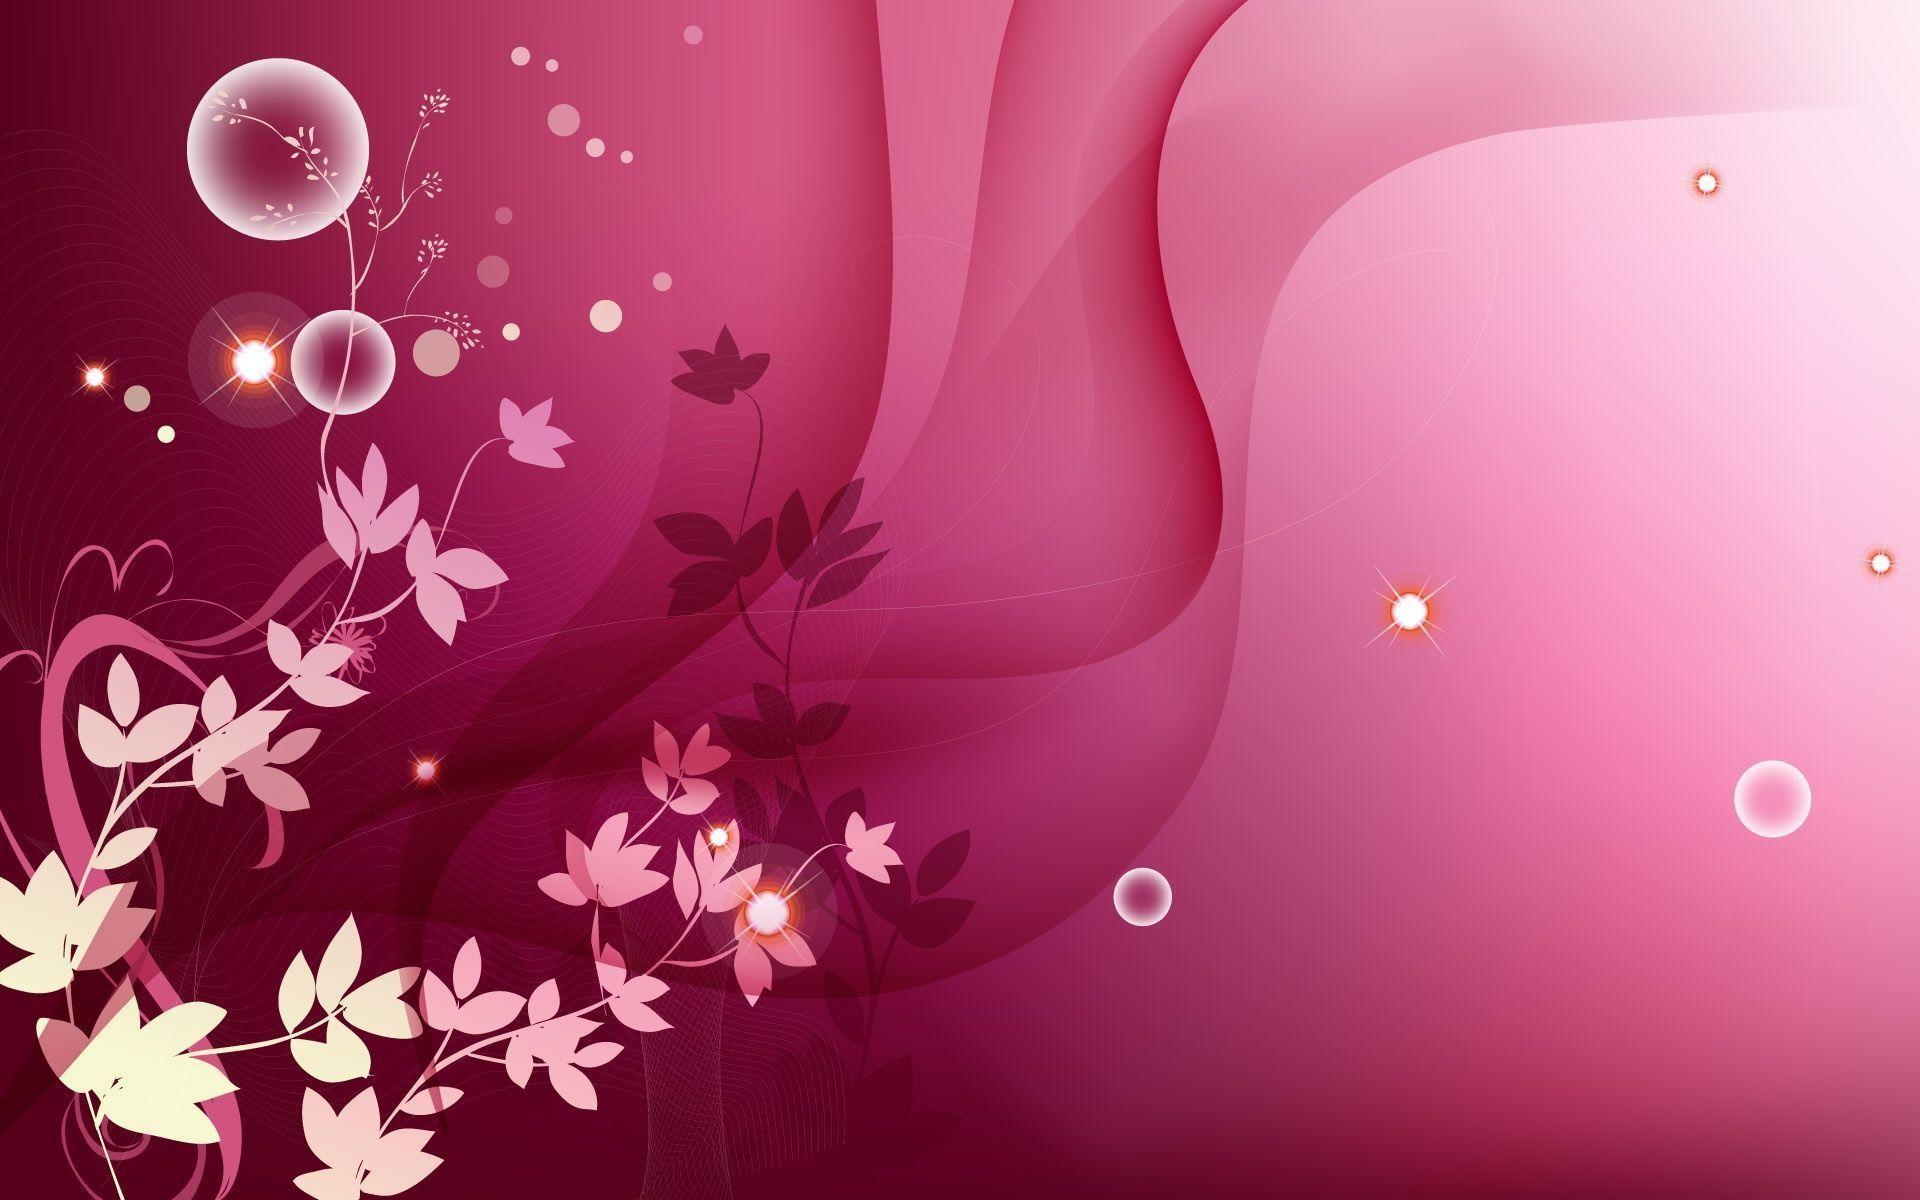 Swirls Pink Purple Leaves Wallpaper and Stock Photo